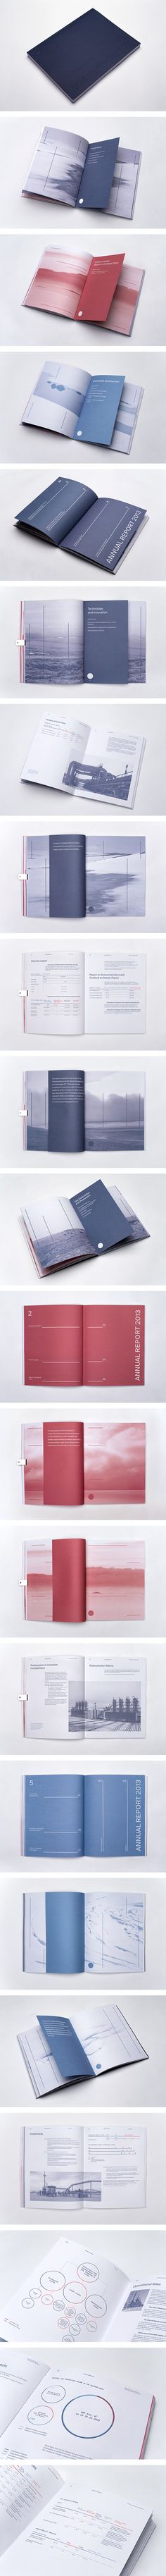 SNGP Annual Report